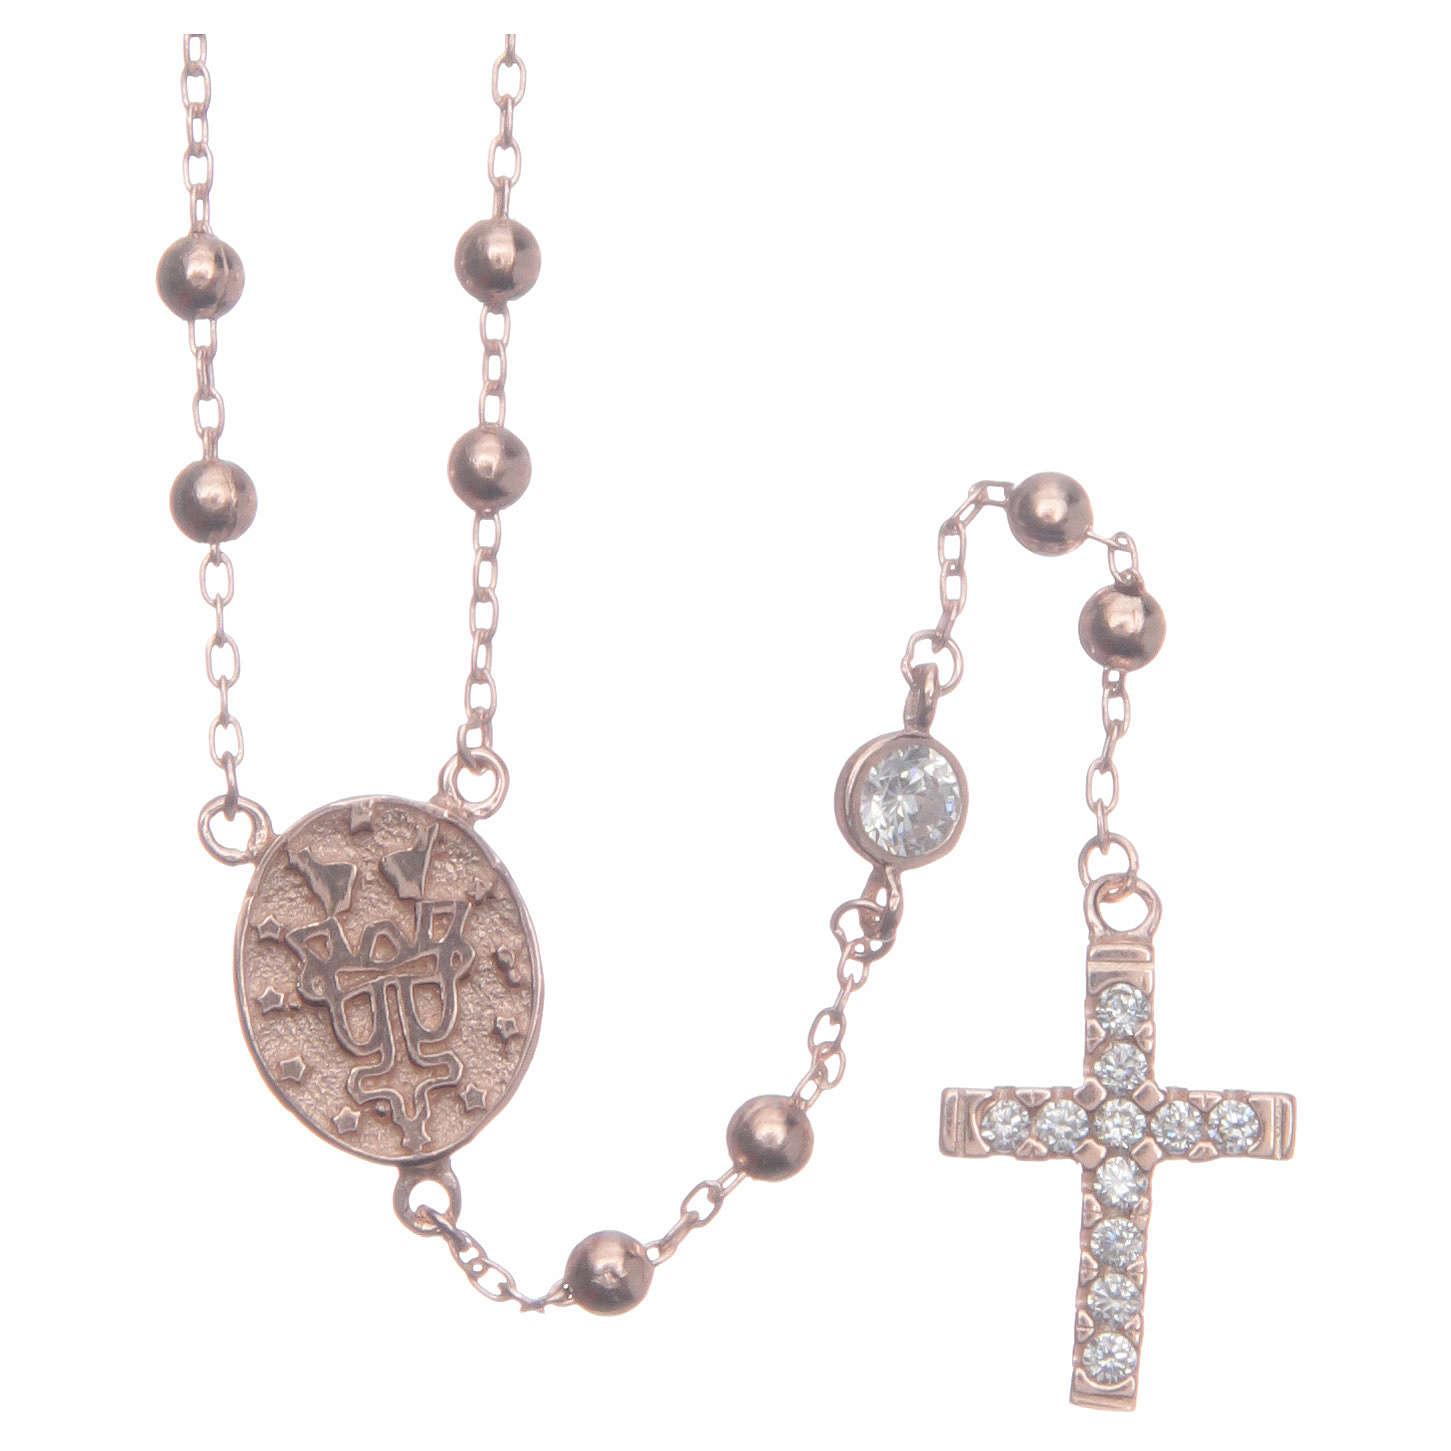 Rosario classico rosé Santa Rita zirconi bianchi argento 925 4